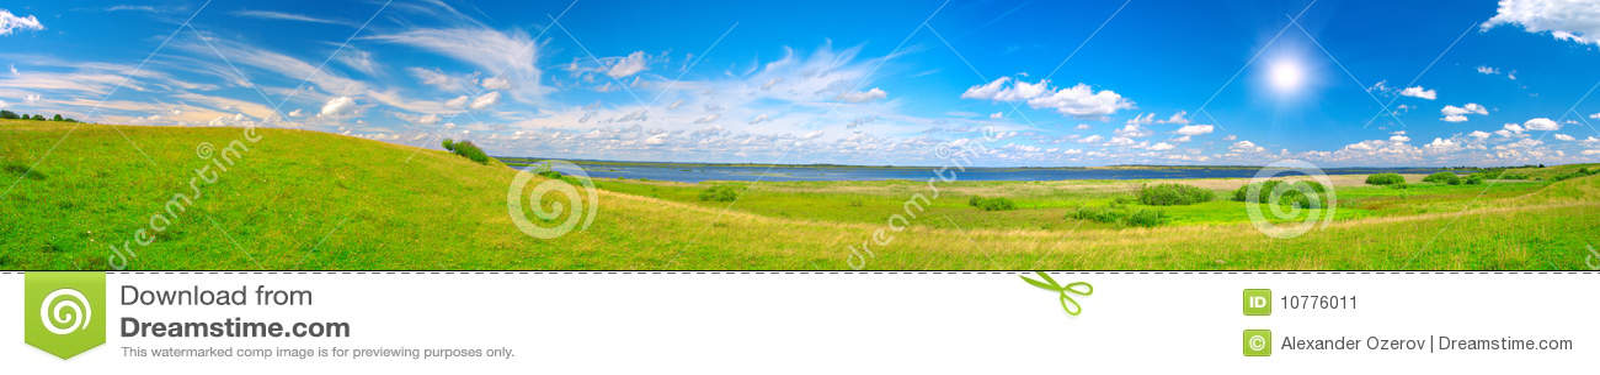 Panorama van mooie groene vallei